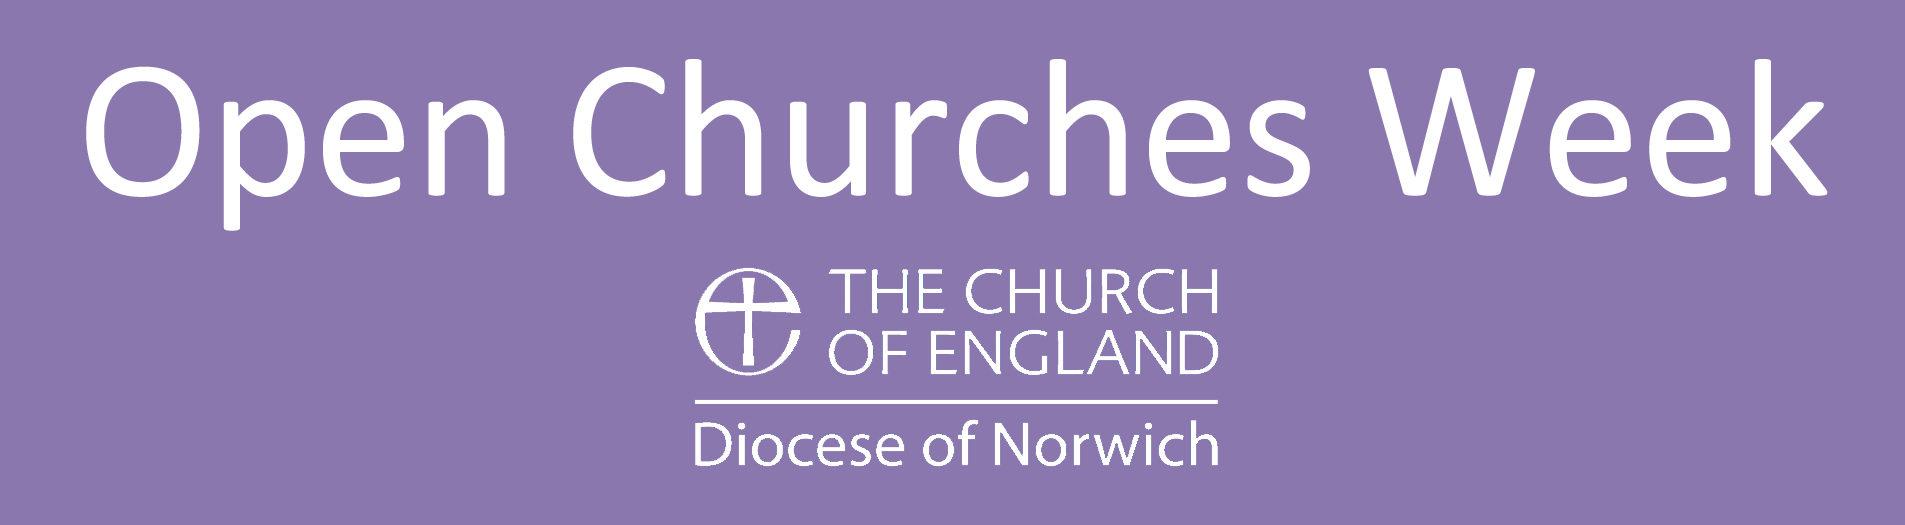 Open Churches Week